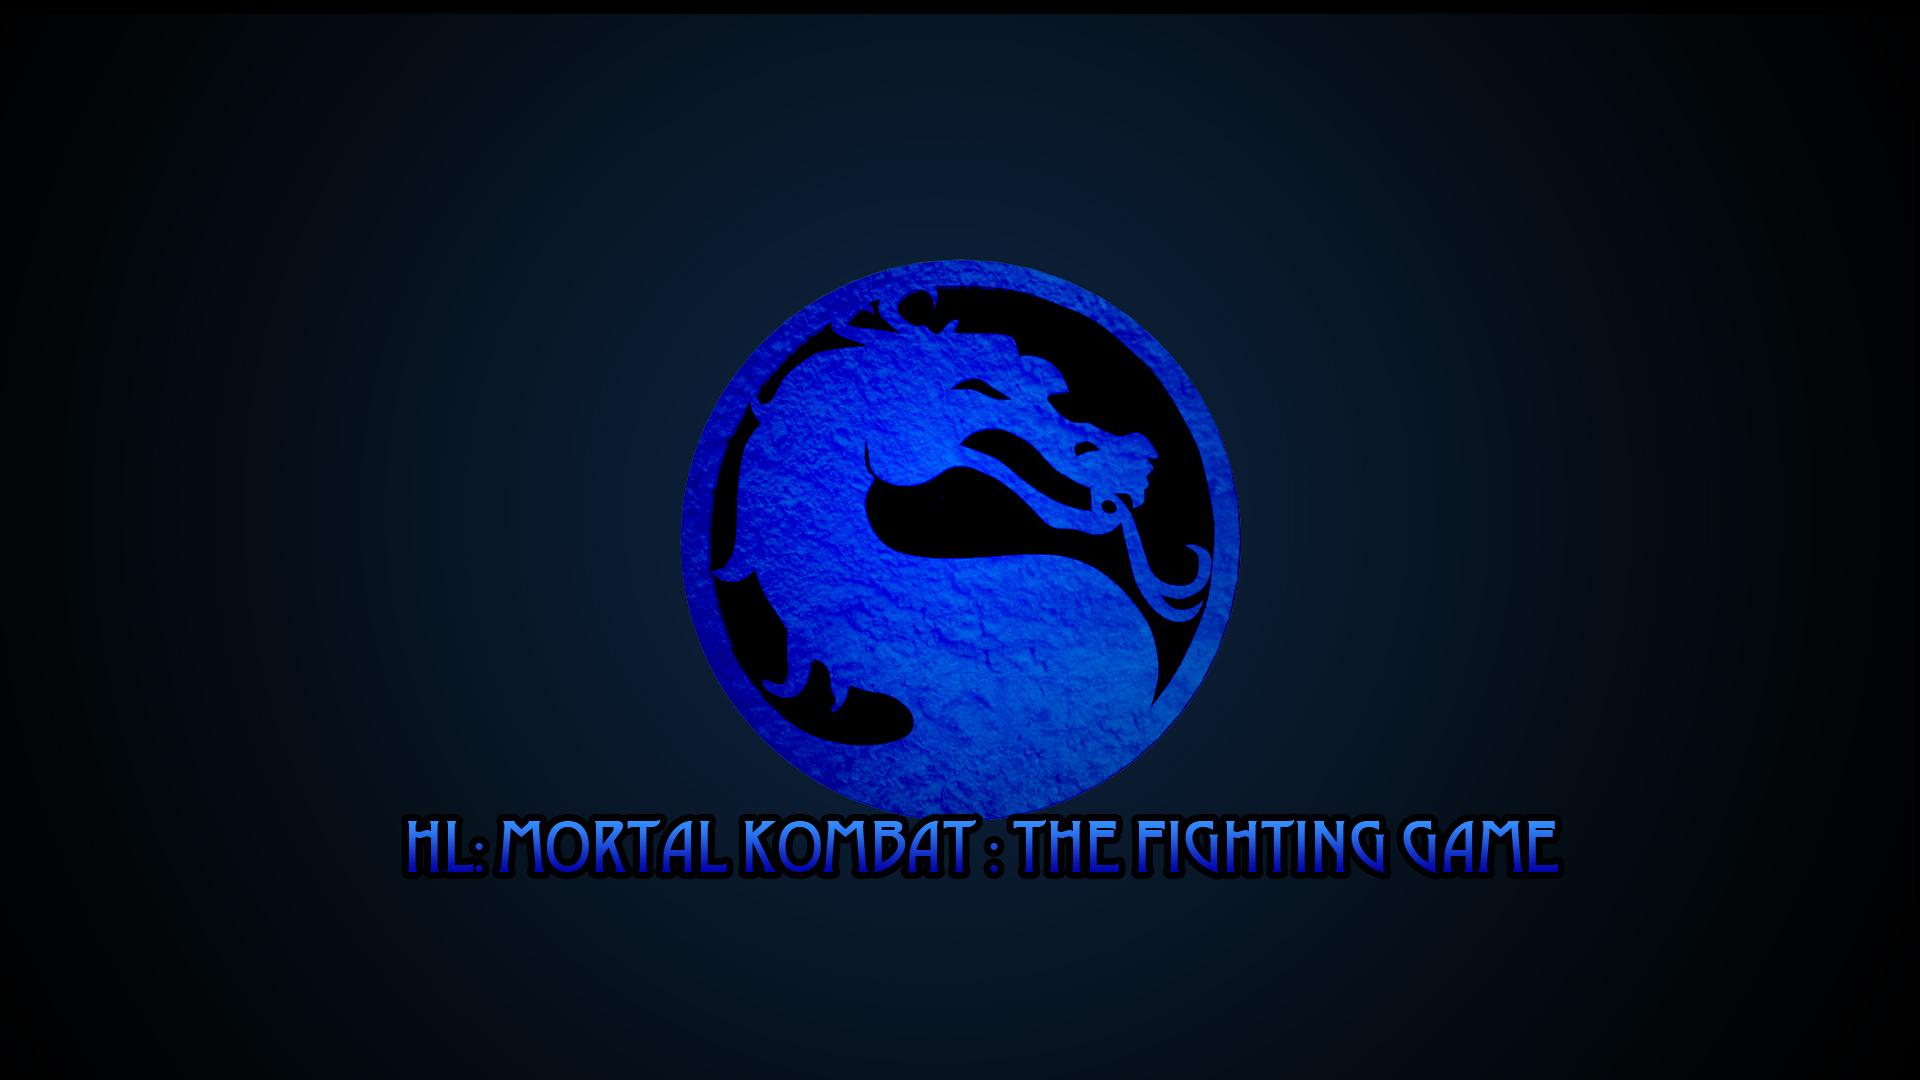 Mortal Kombat Logo Image Mod Db